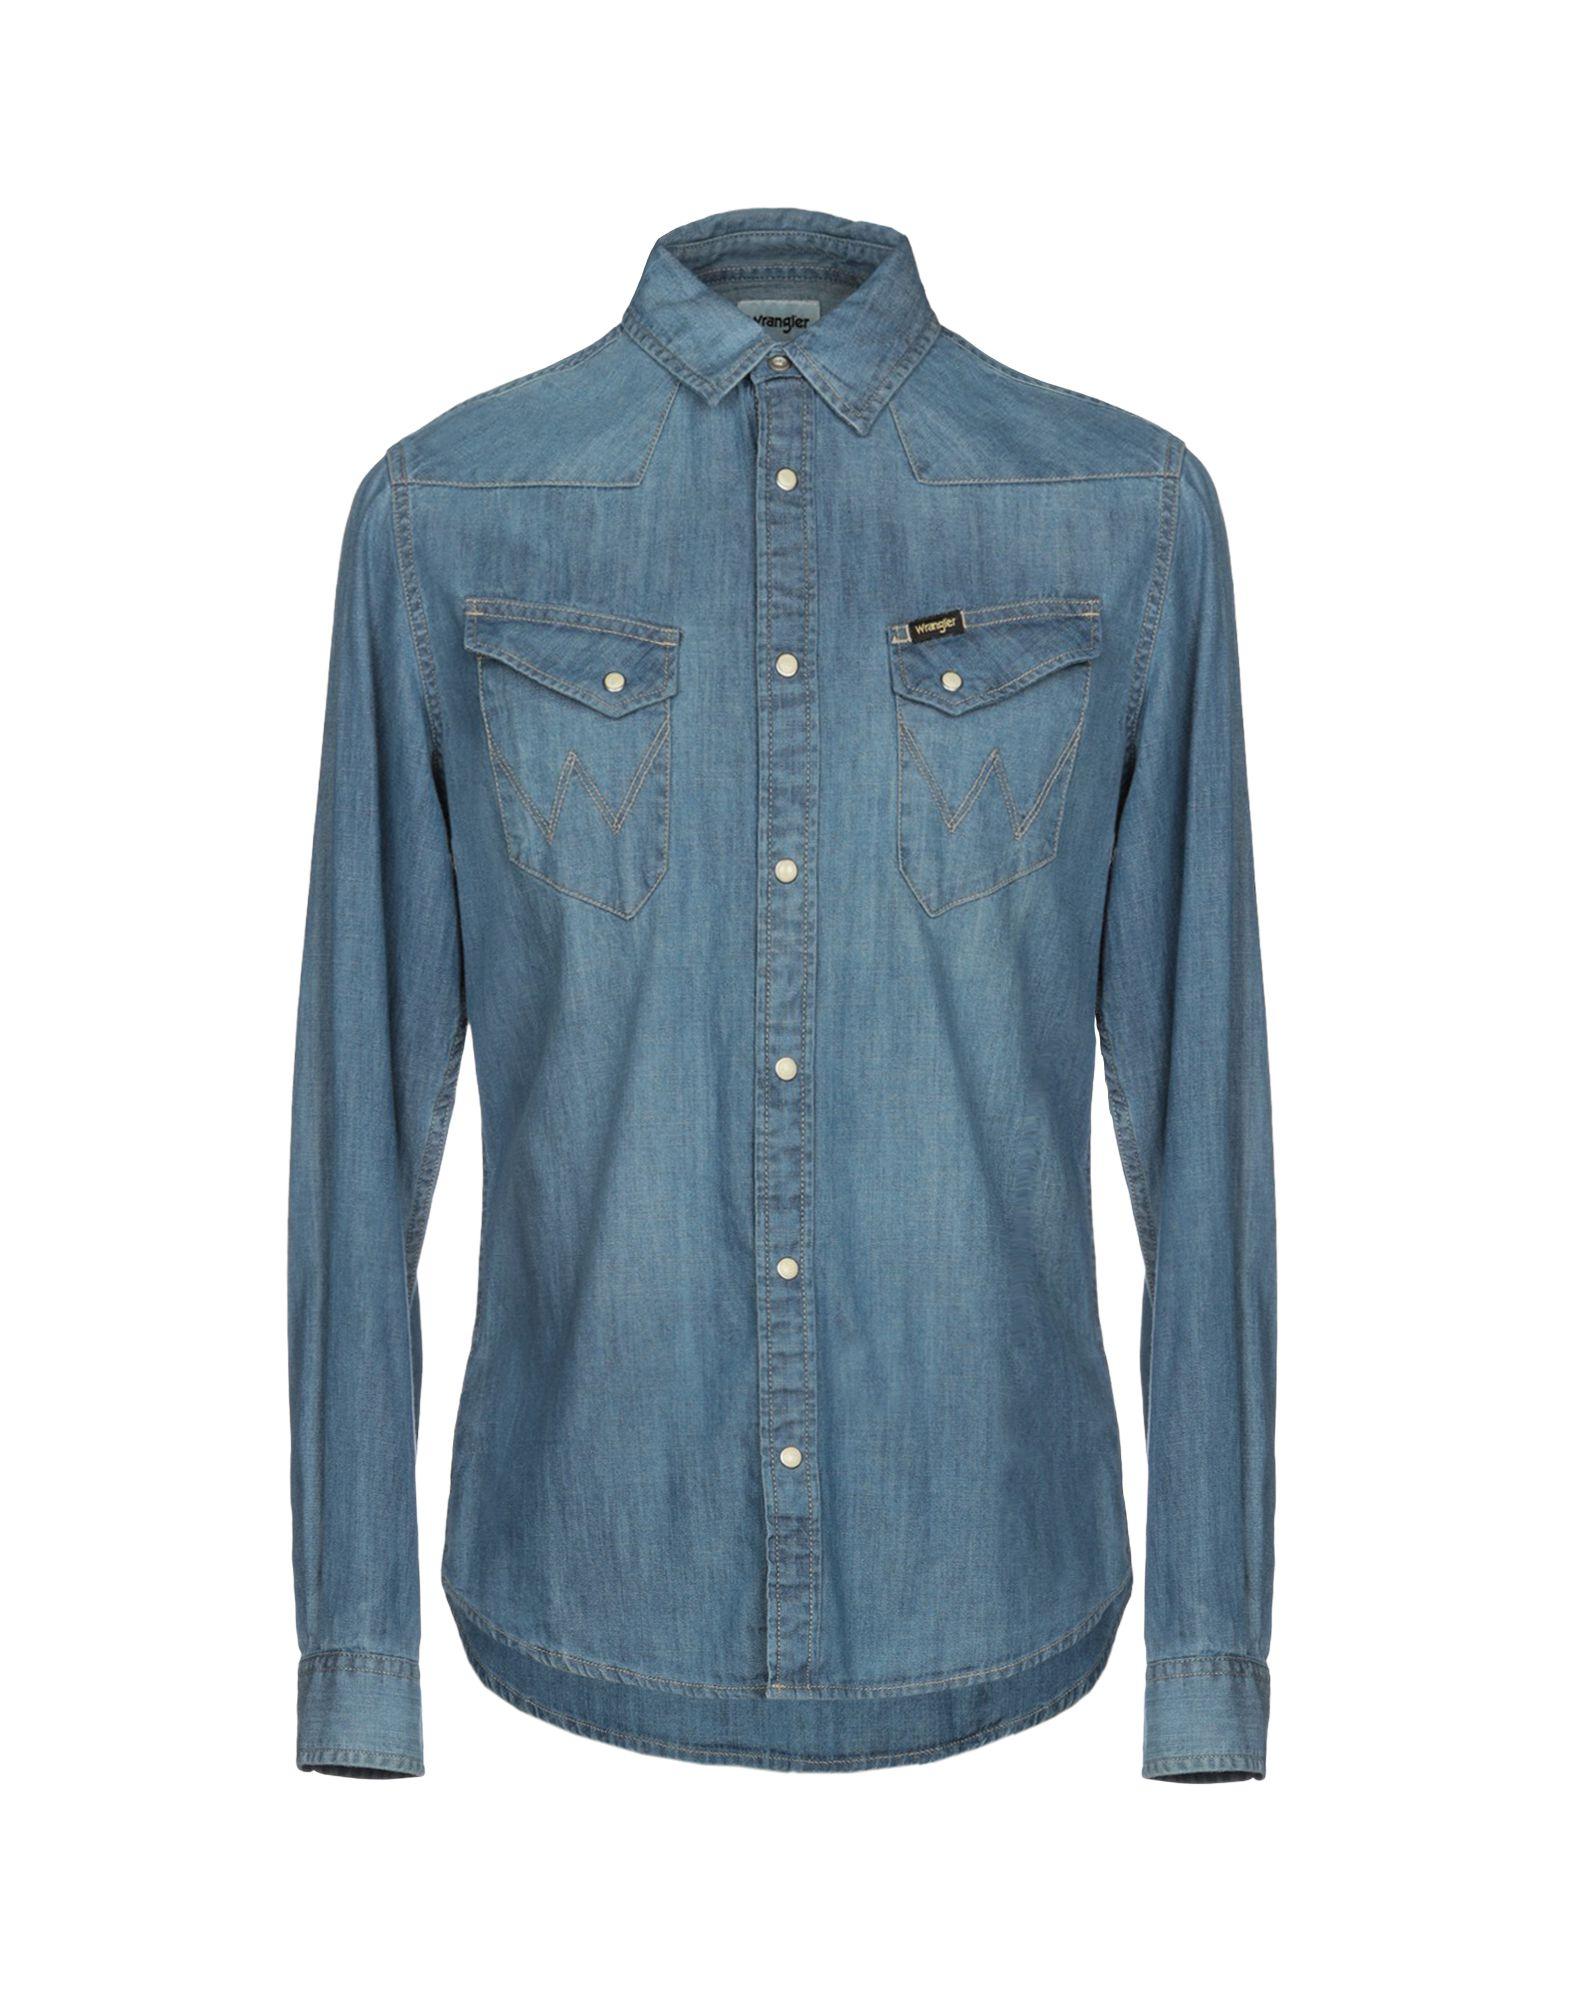 958f8091 Wrangler Denim Shirt - Men Wrangler Denim Shirts online on YOOX United  States - 42692308NH